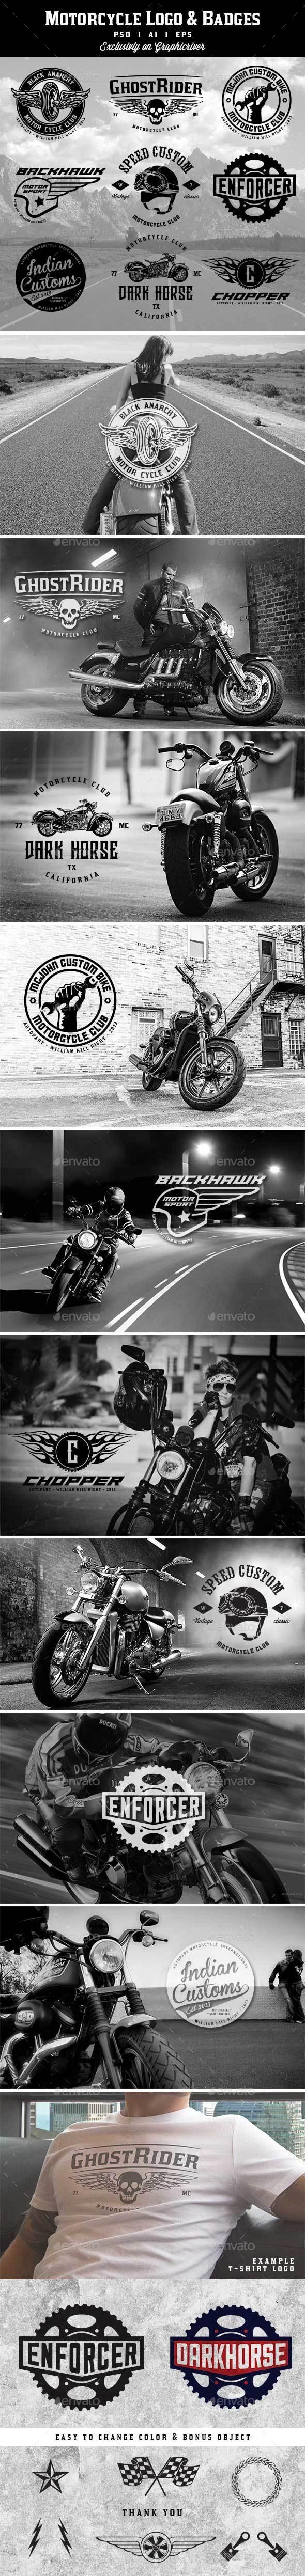 Motorcycle Logo&Badges - Badges & Stickers Web Elements